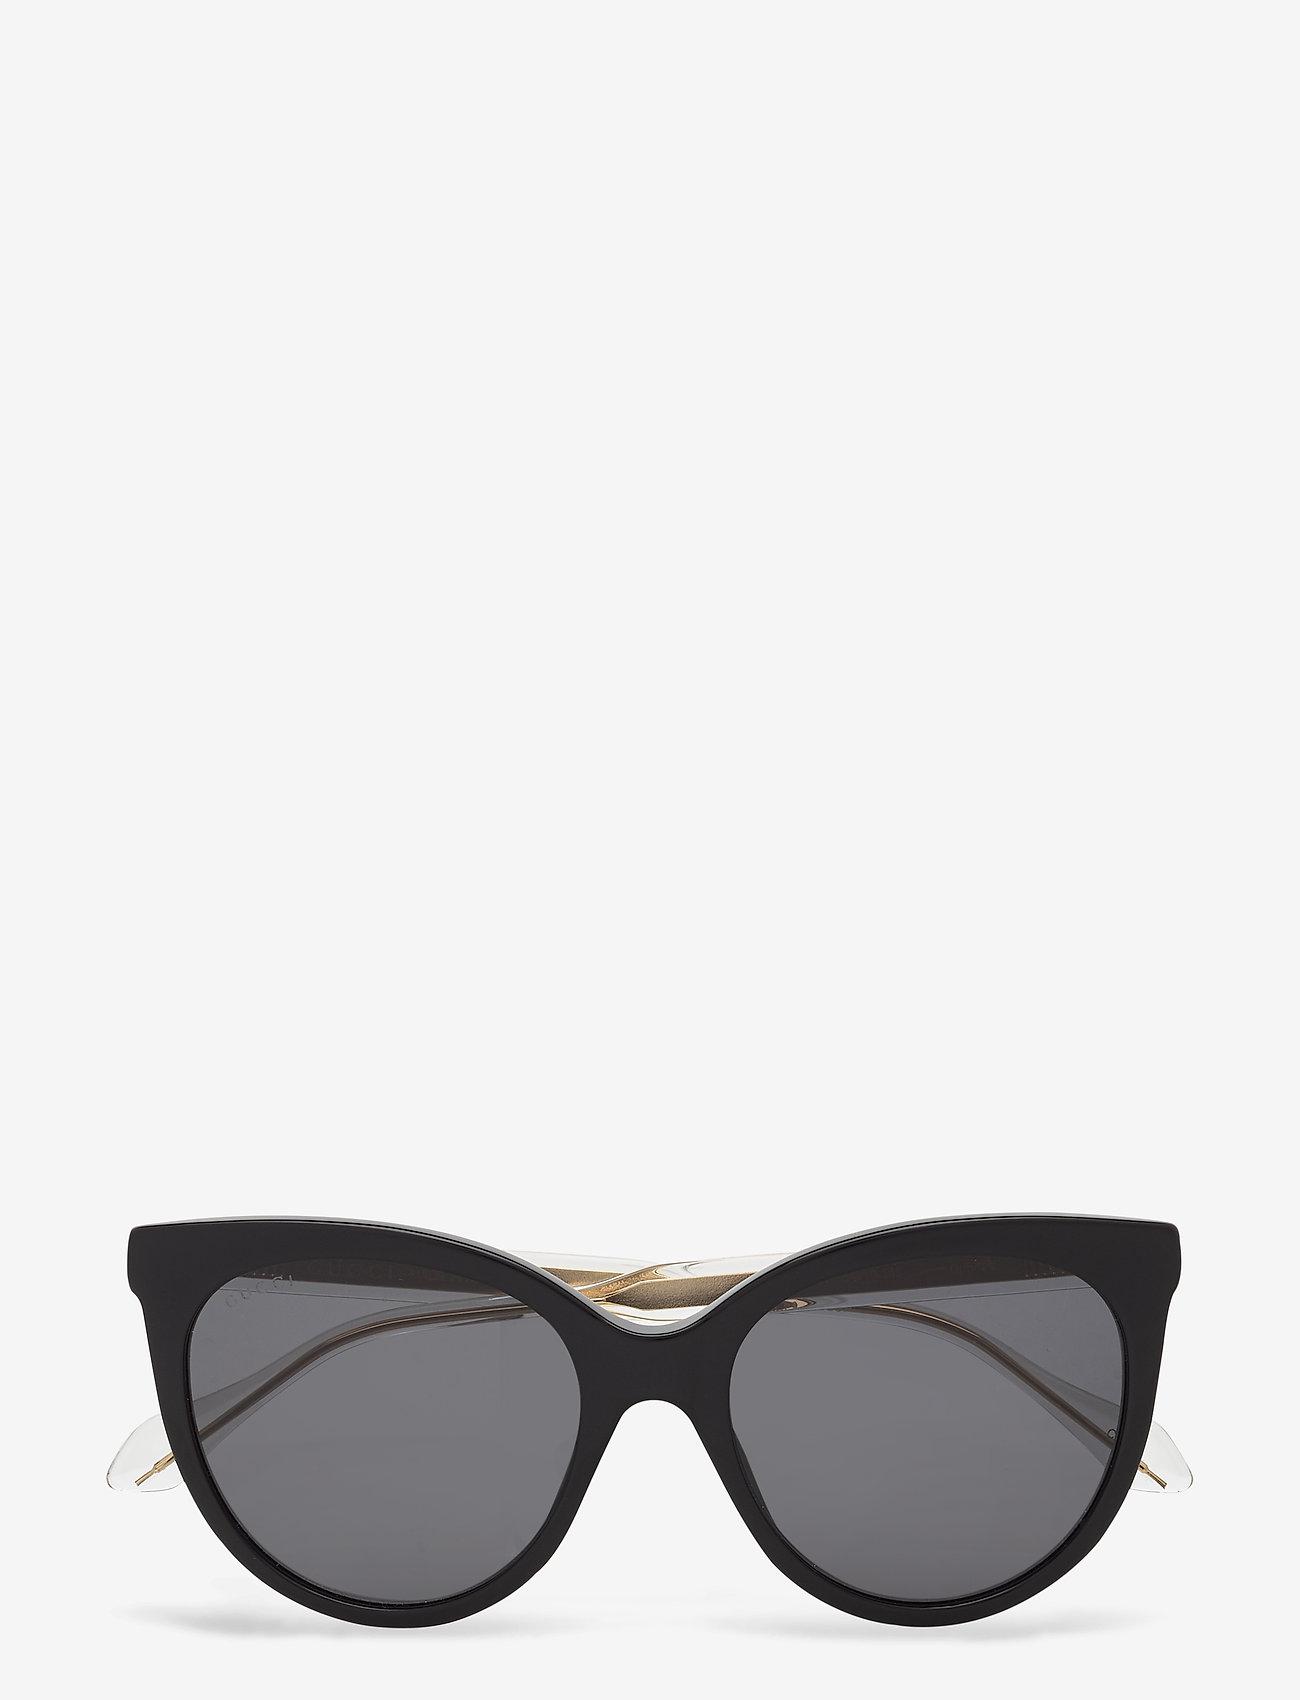 Gucci Sunglasses - GG0565S - cat-eye - black-crystal-grey - 0